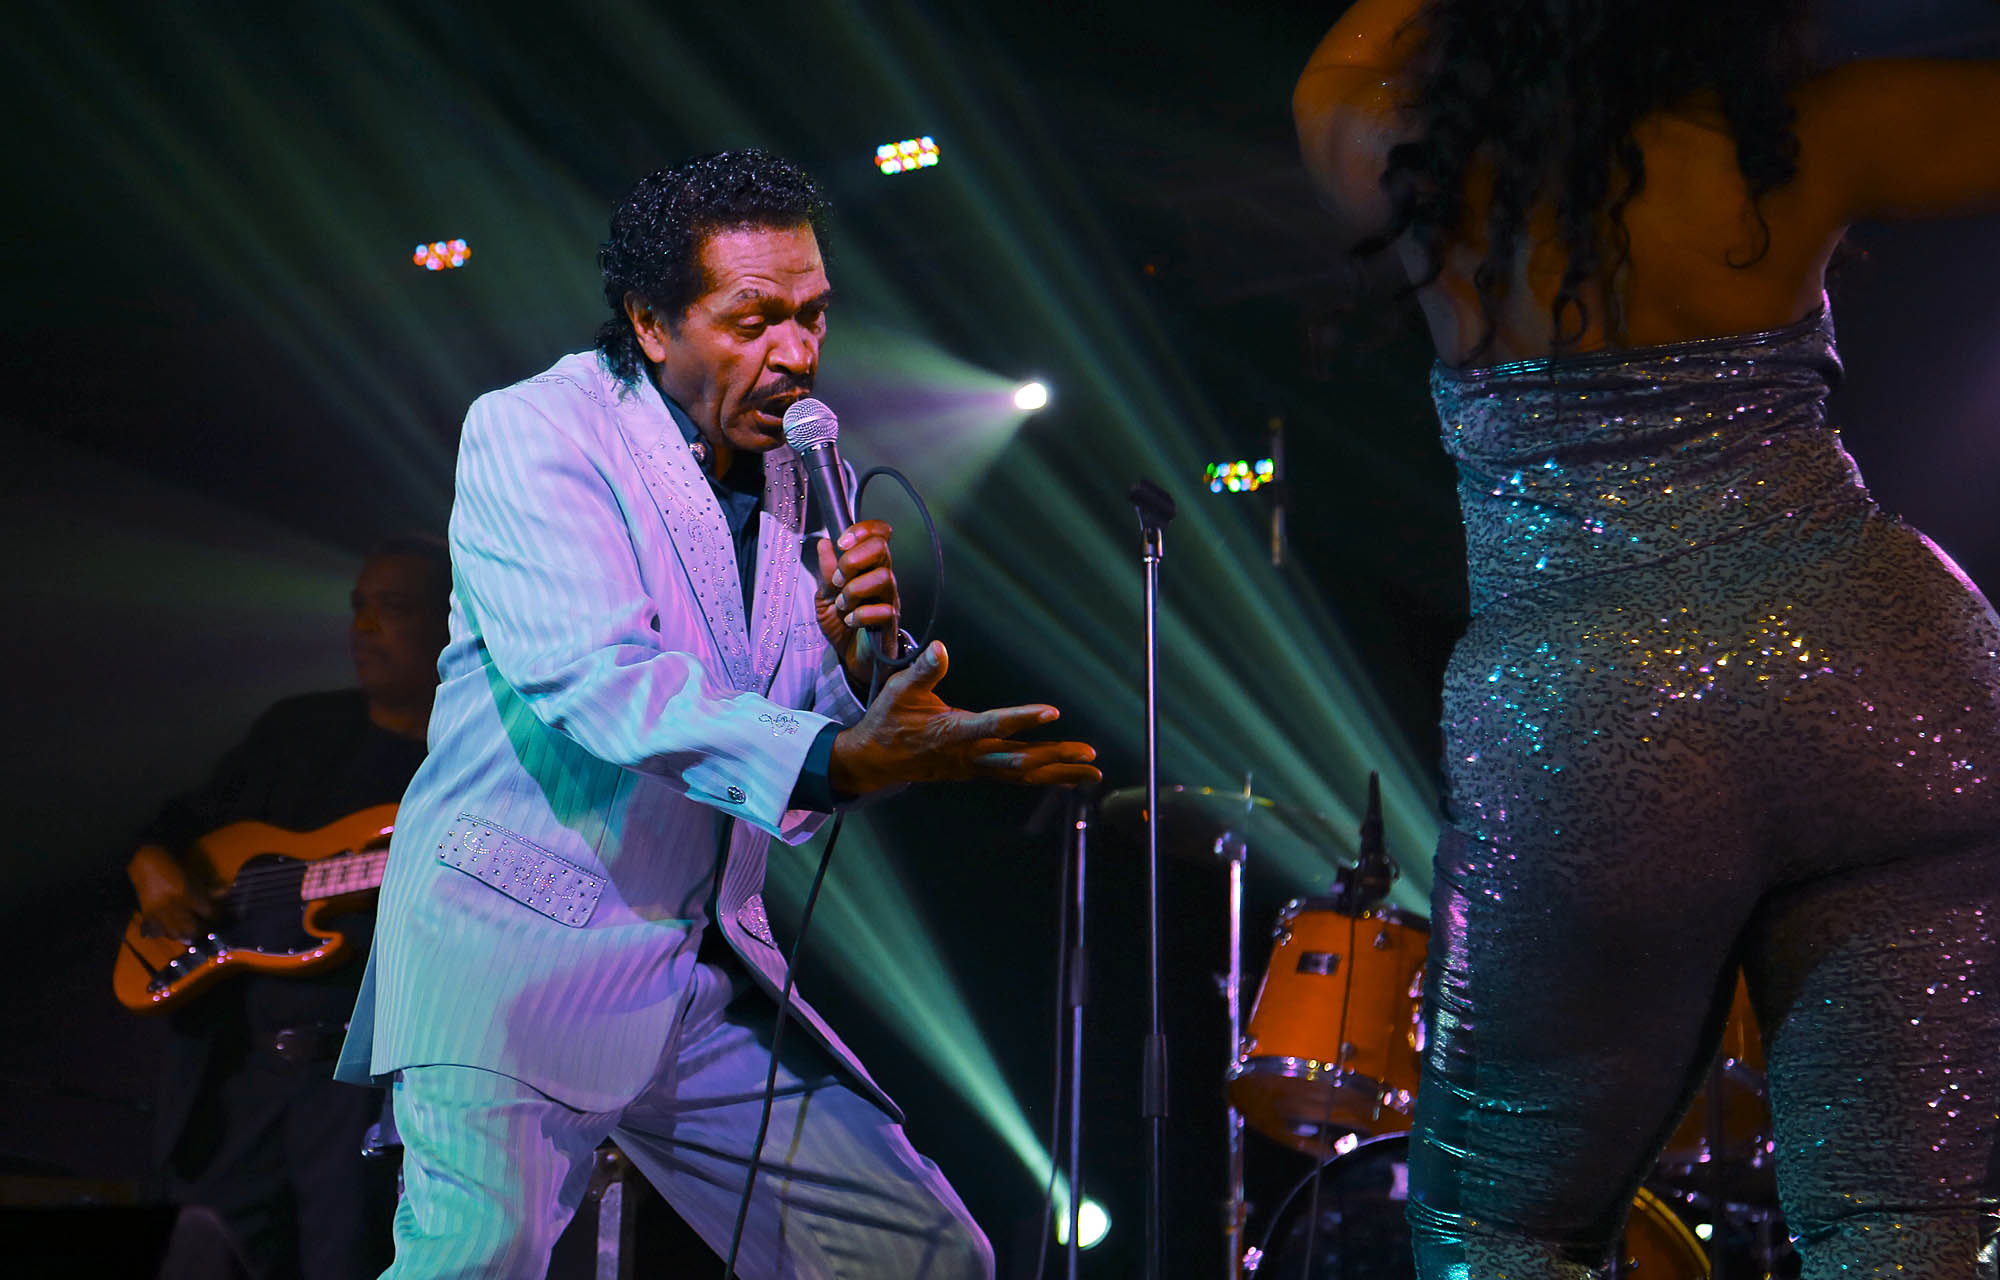 Bobby Rush in Memphis